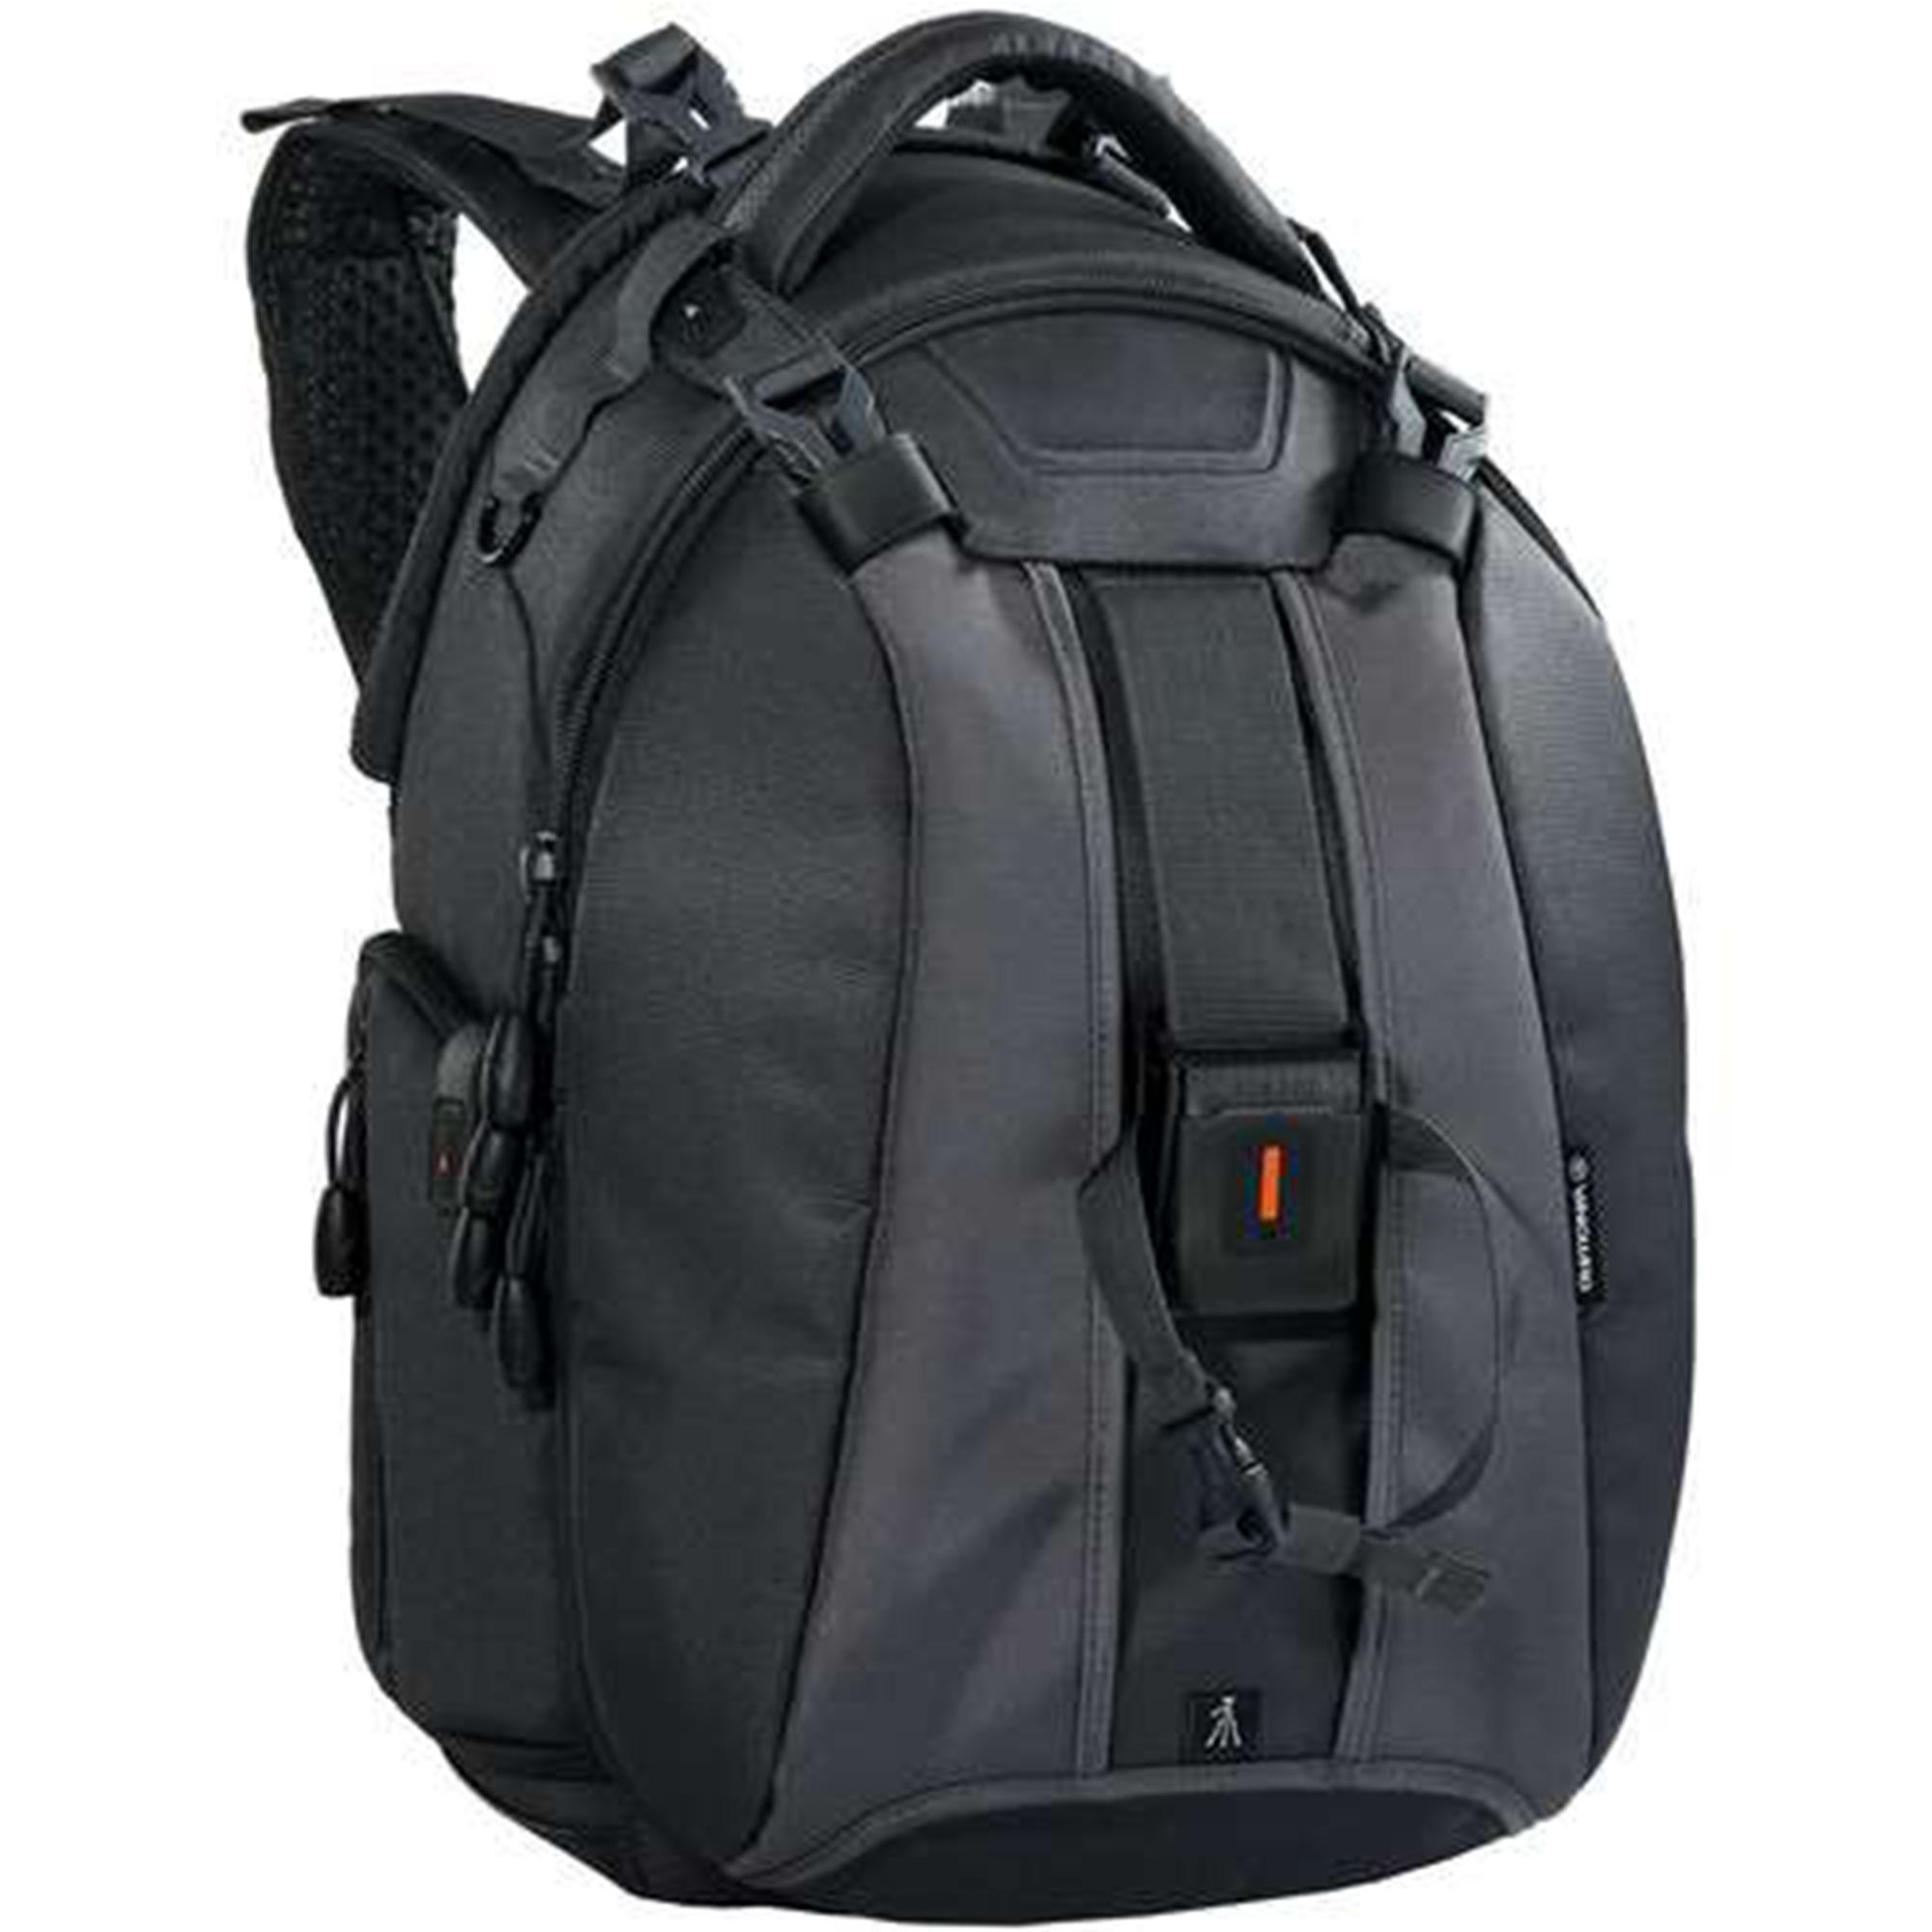 Vanguard Skyborne 48 Bag